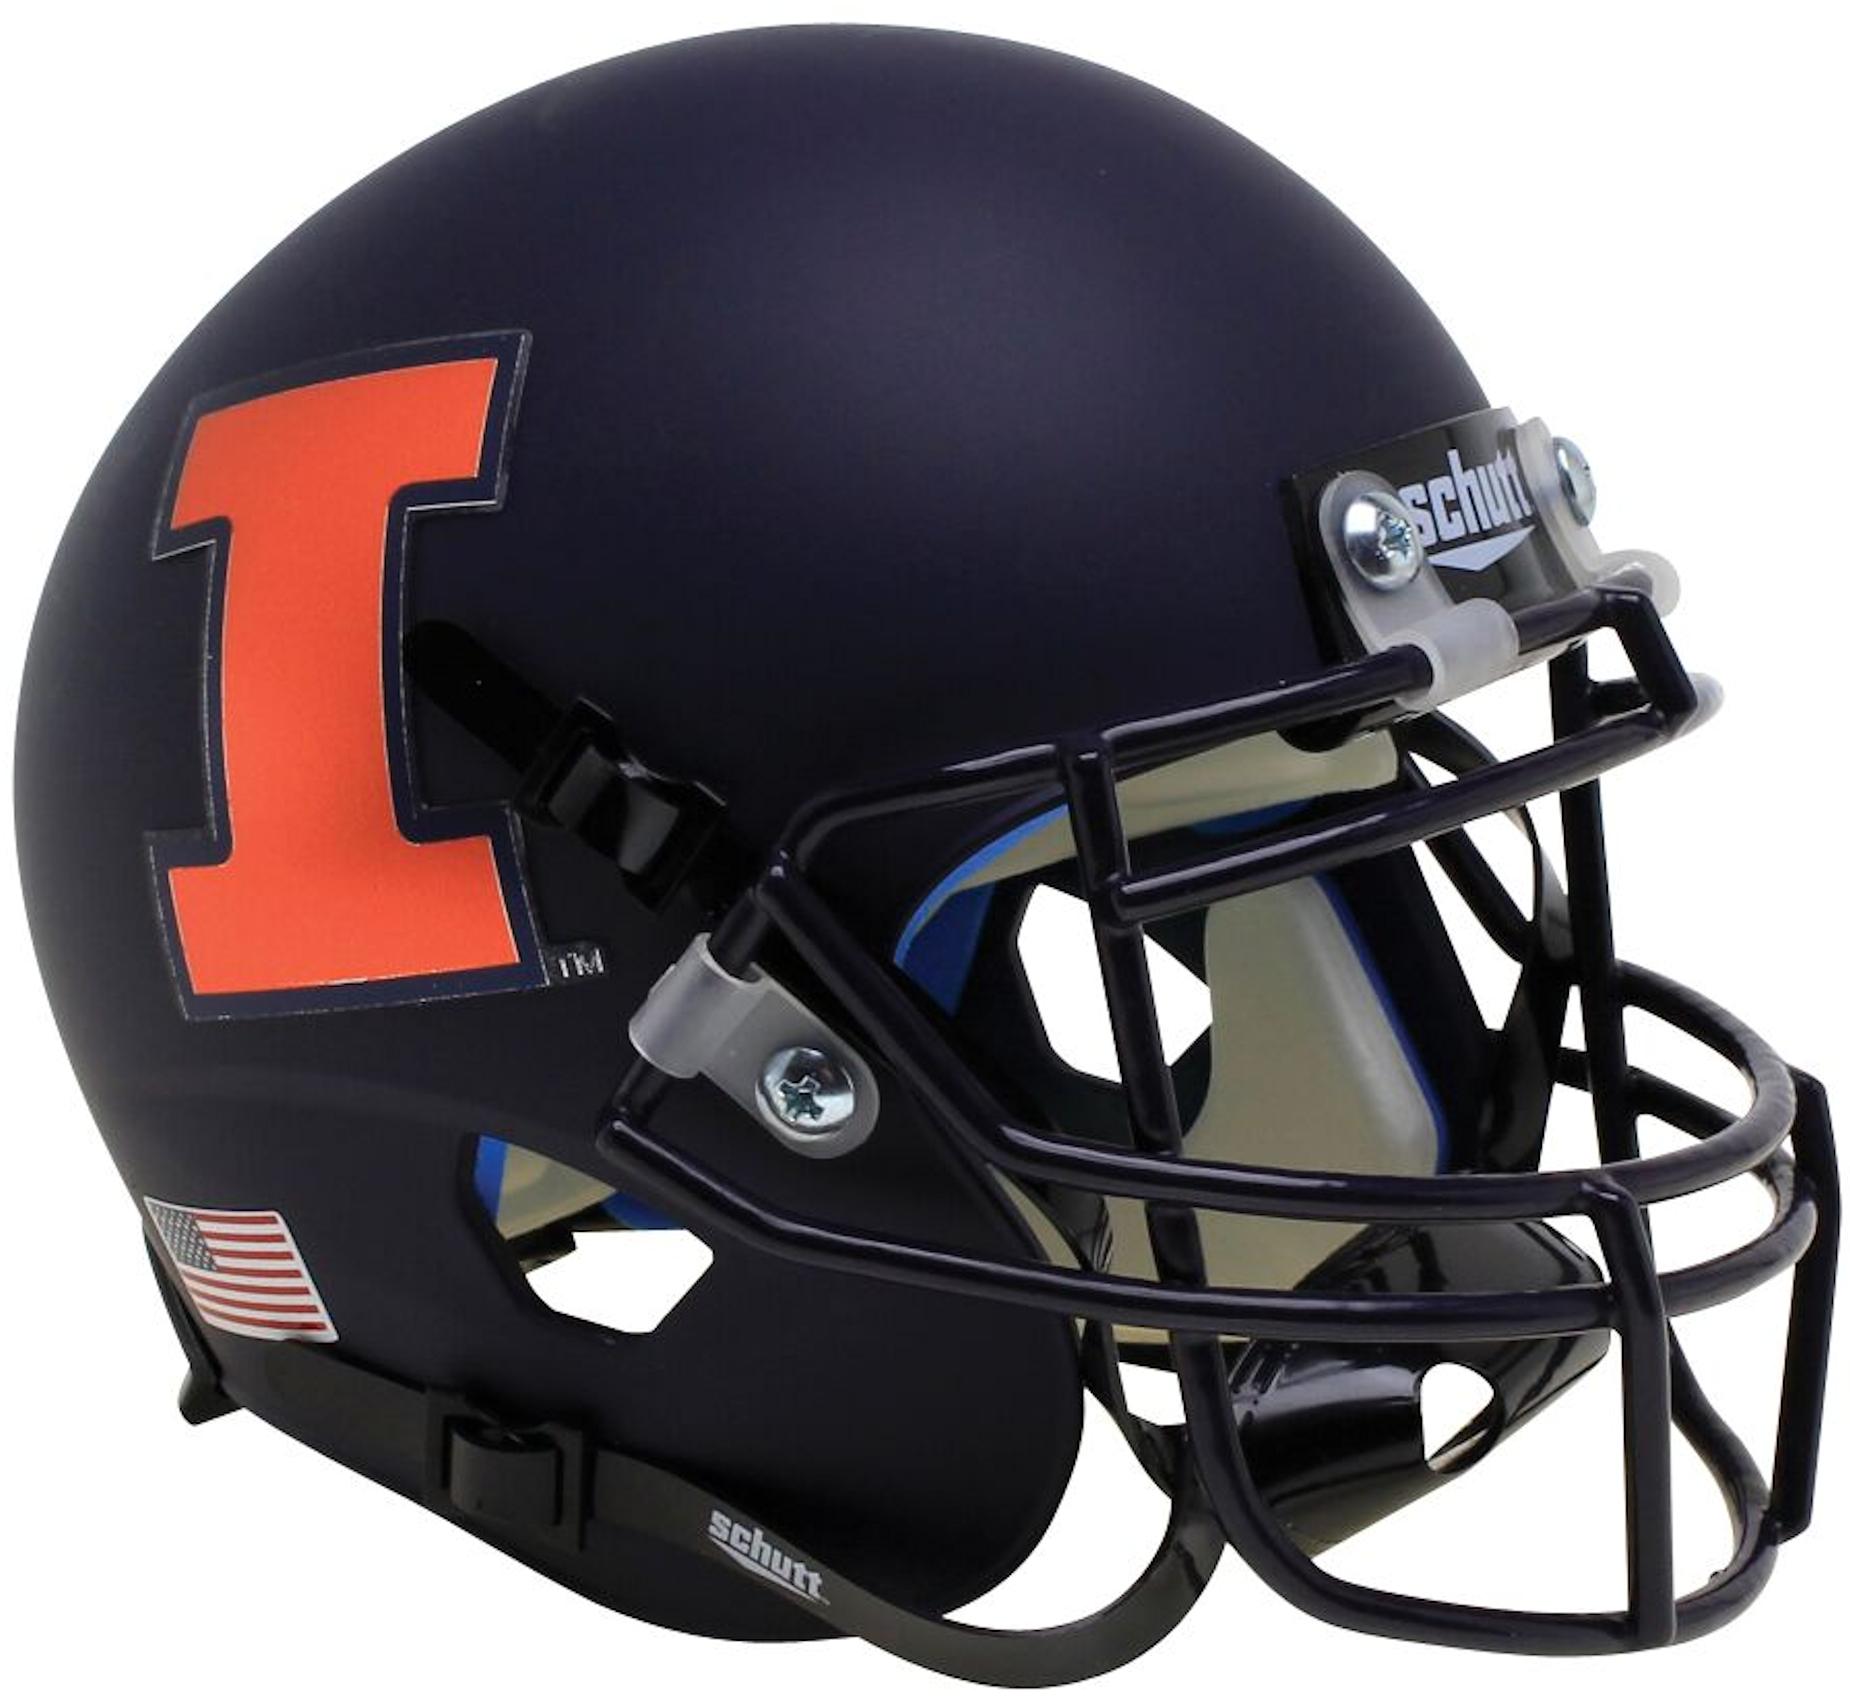 Illinois Fighting Illini Authentic College XP Football Helmet Schutt <B>Matte Black Orange I</B>